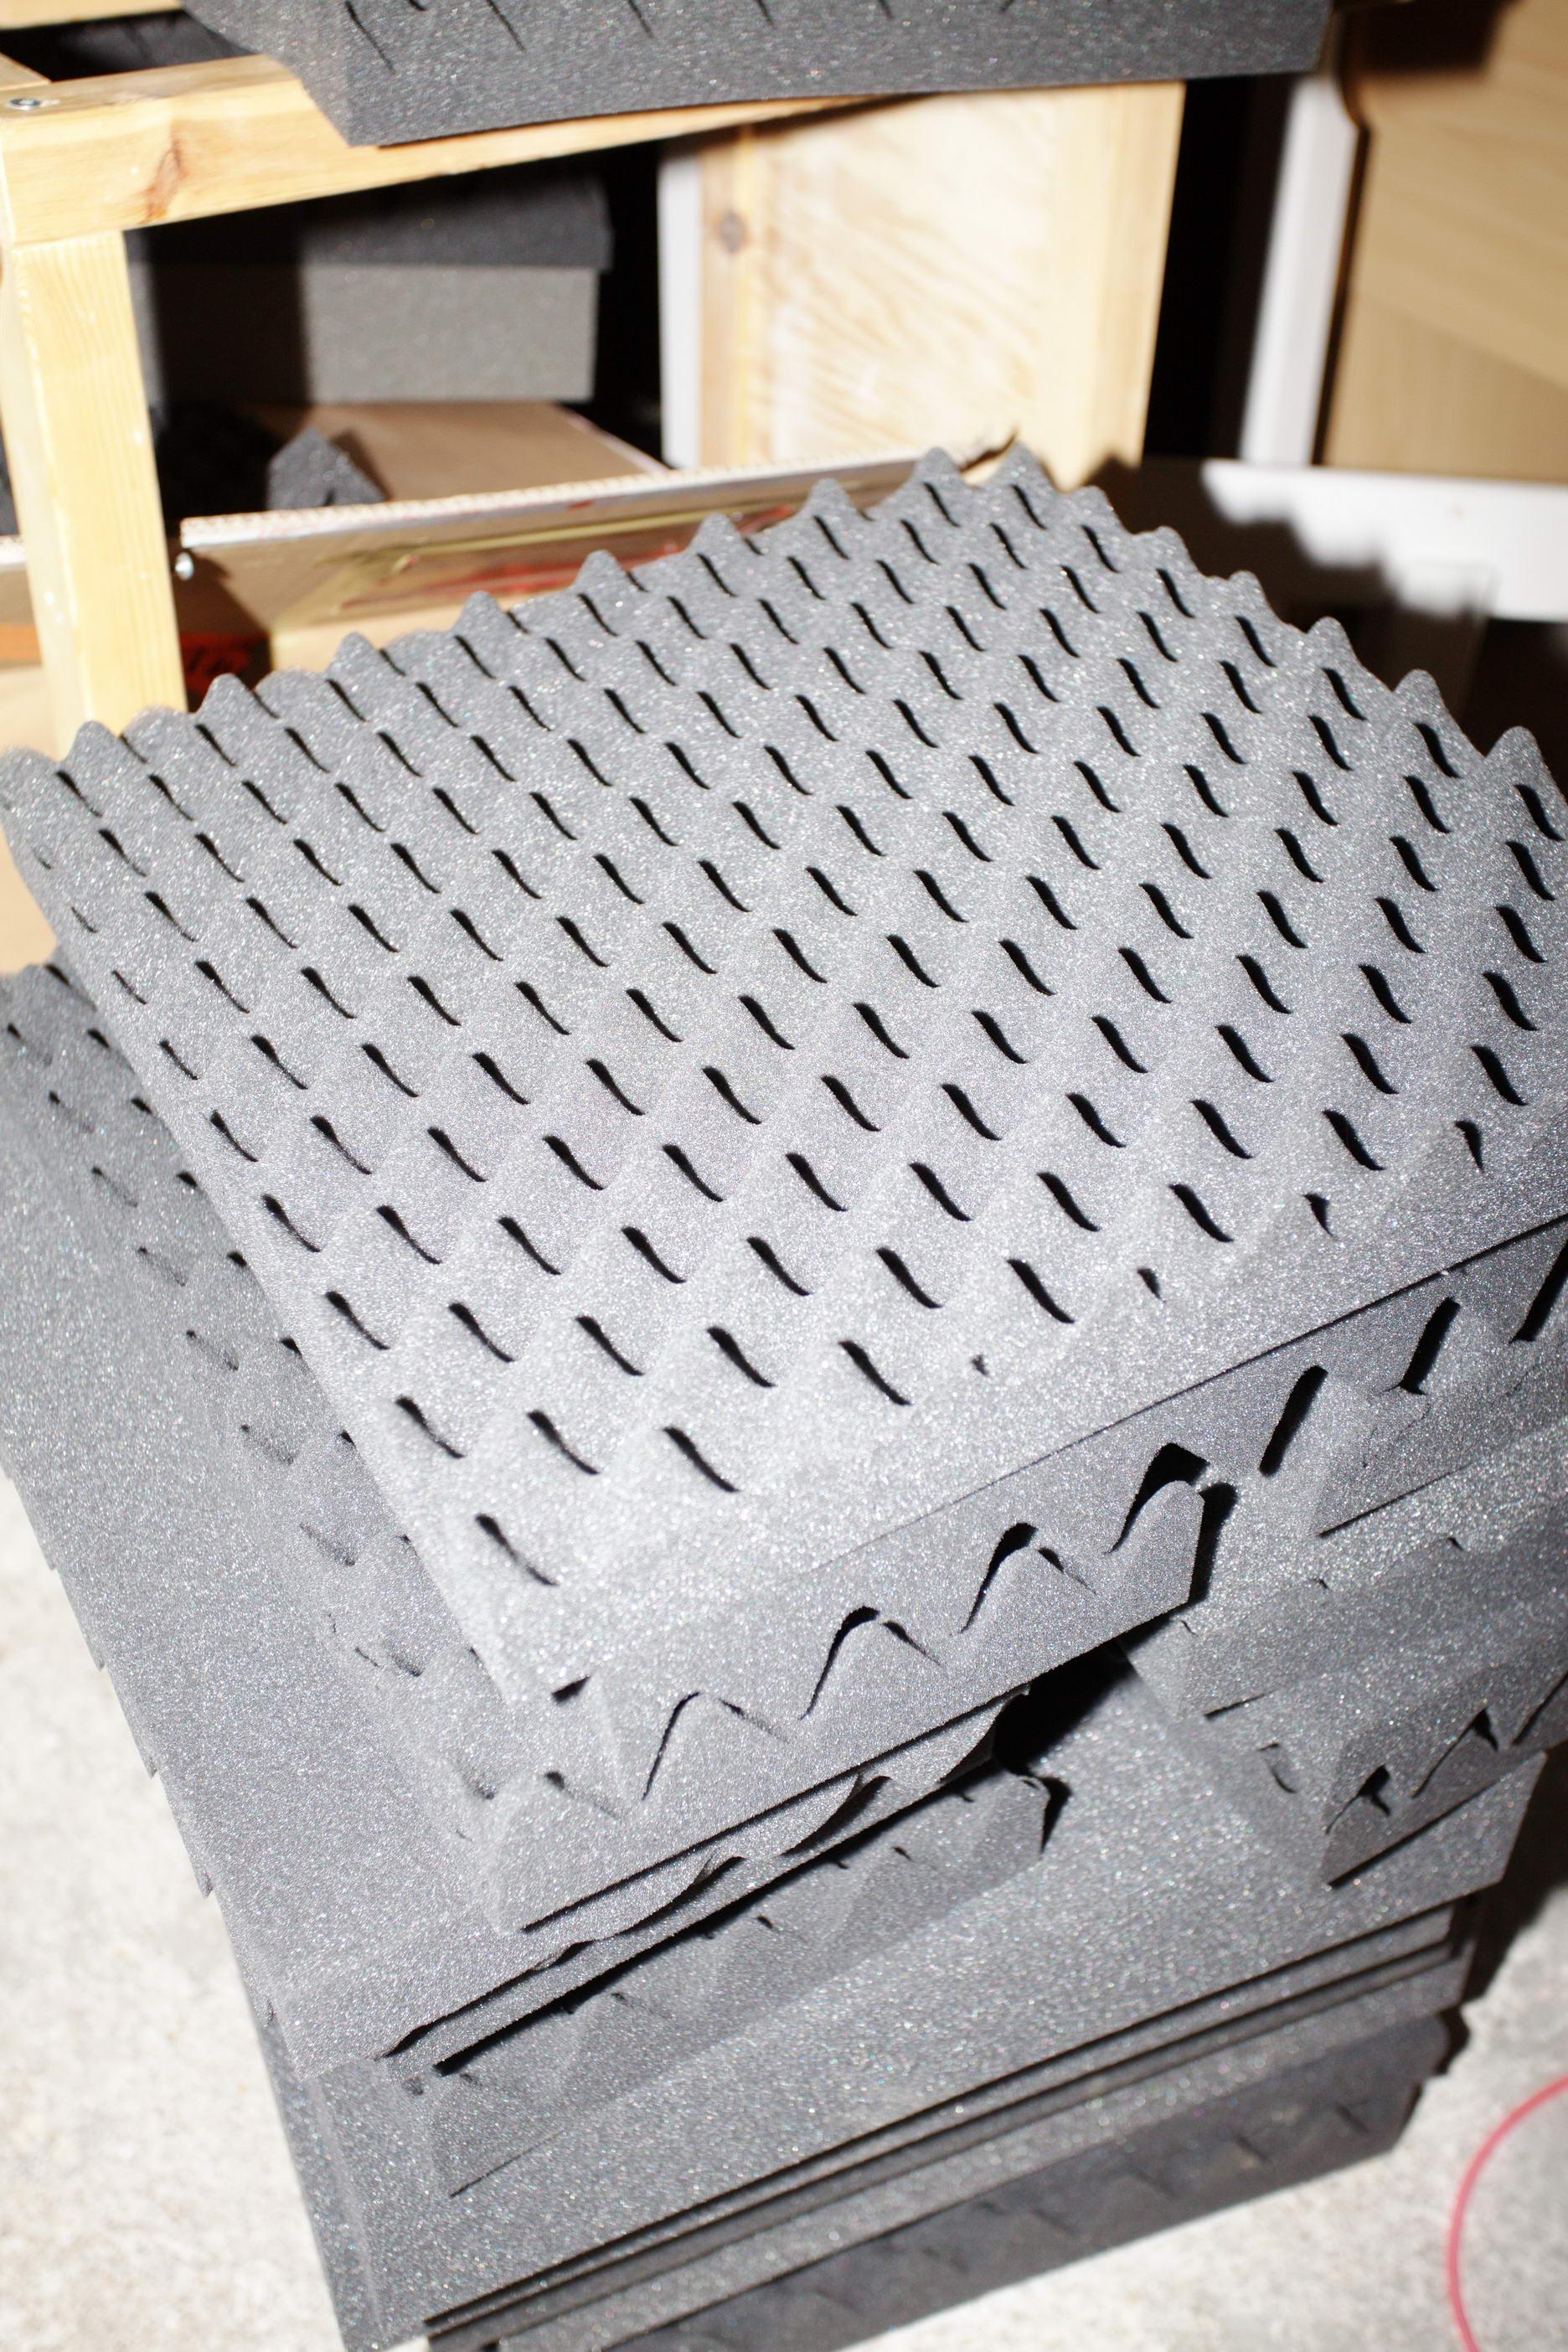 mousse acoustique. Black Bedroom Furniture Sets. Home Design Ideas